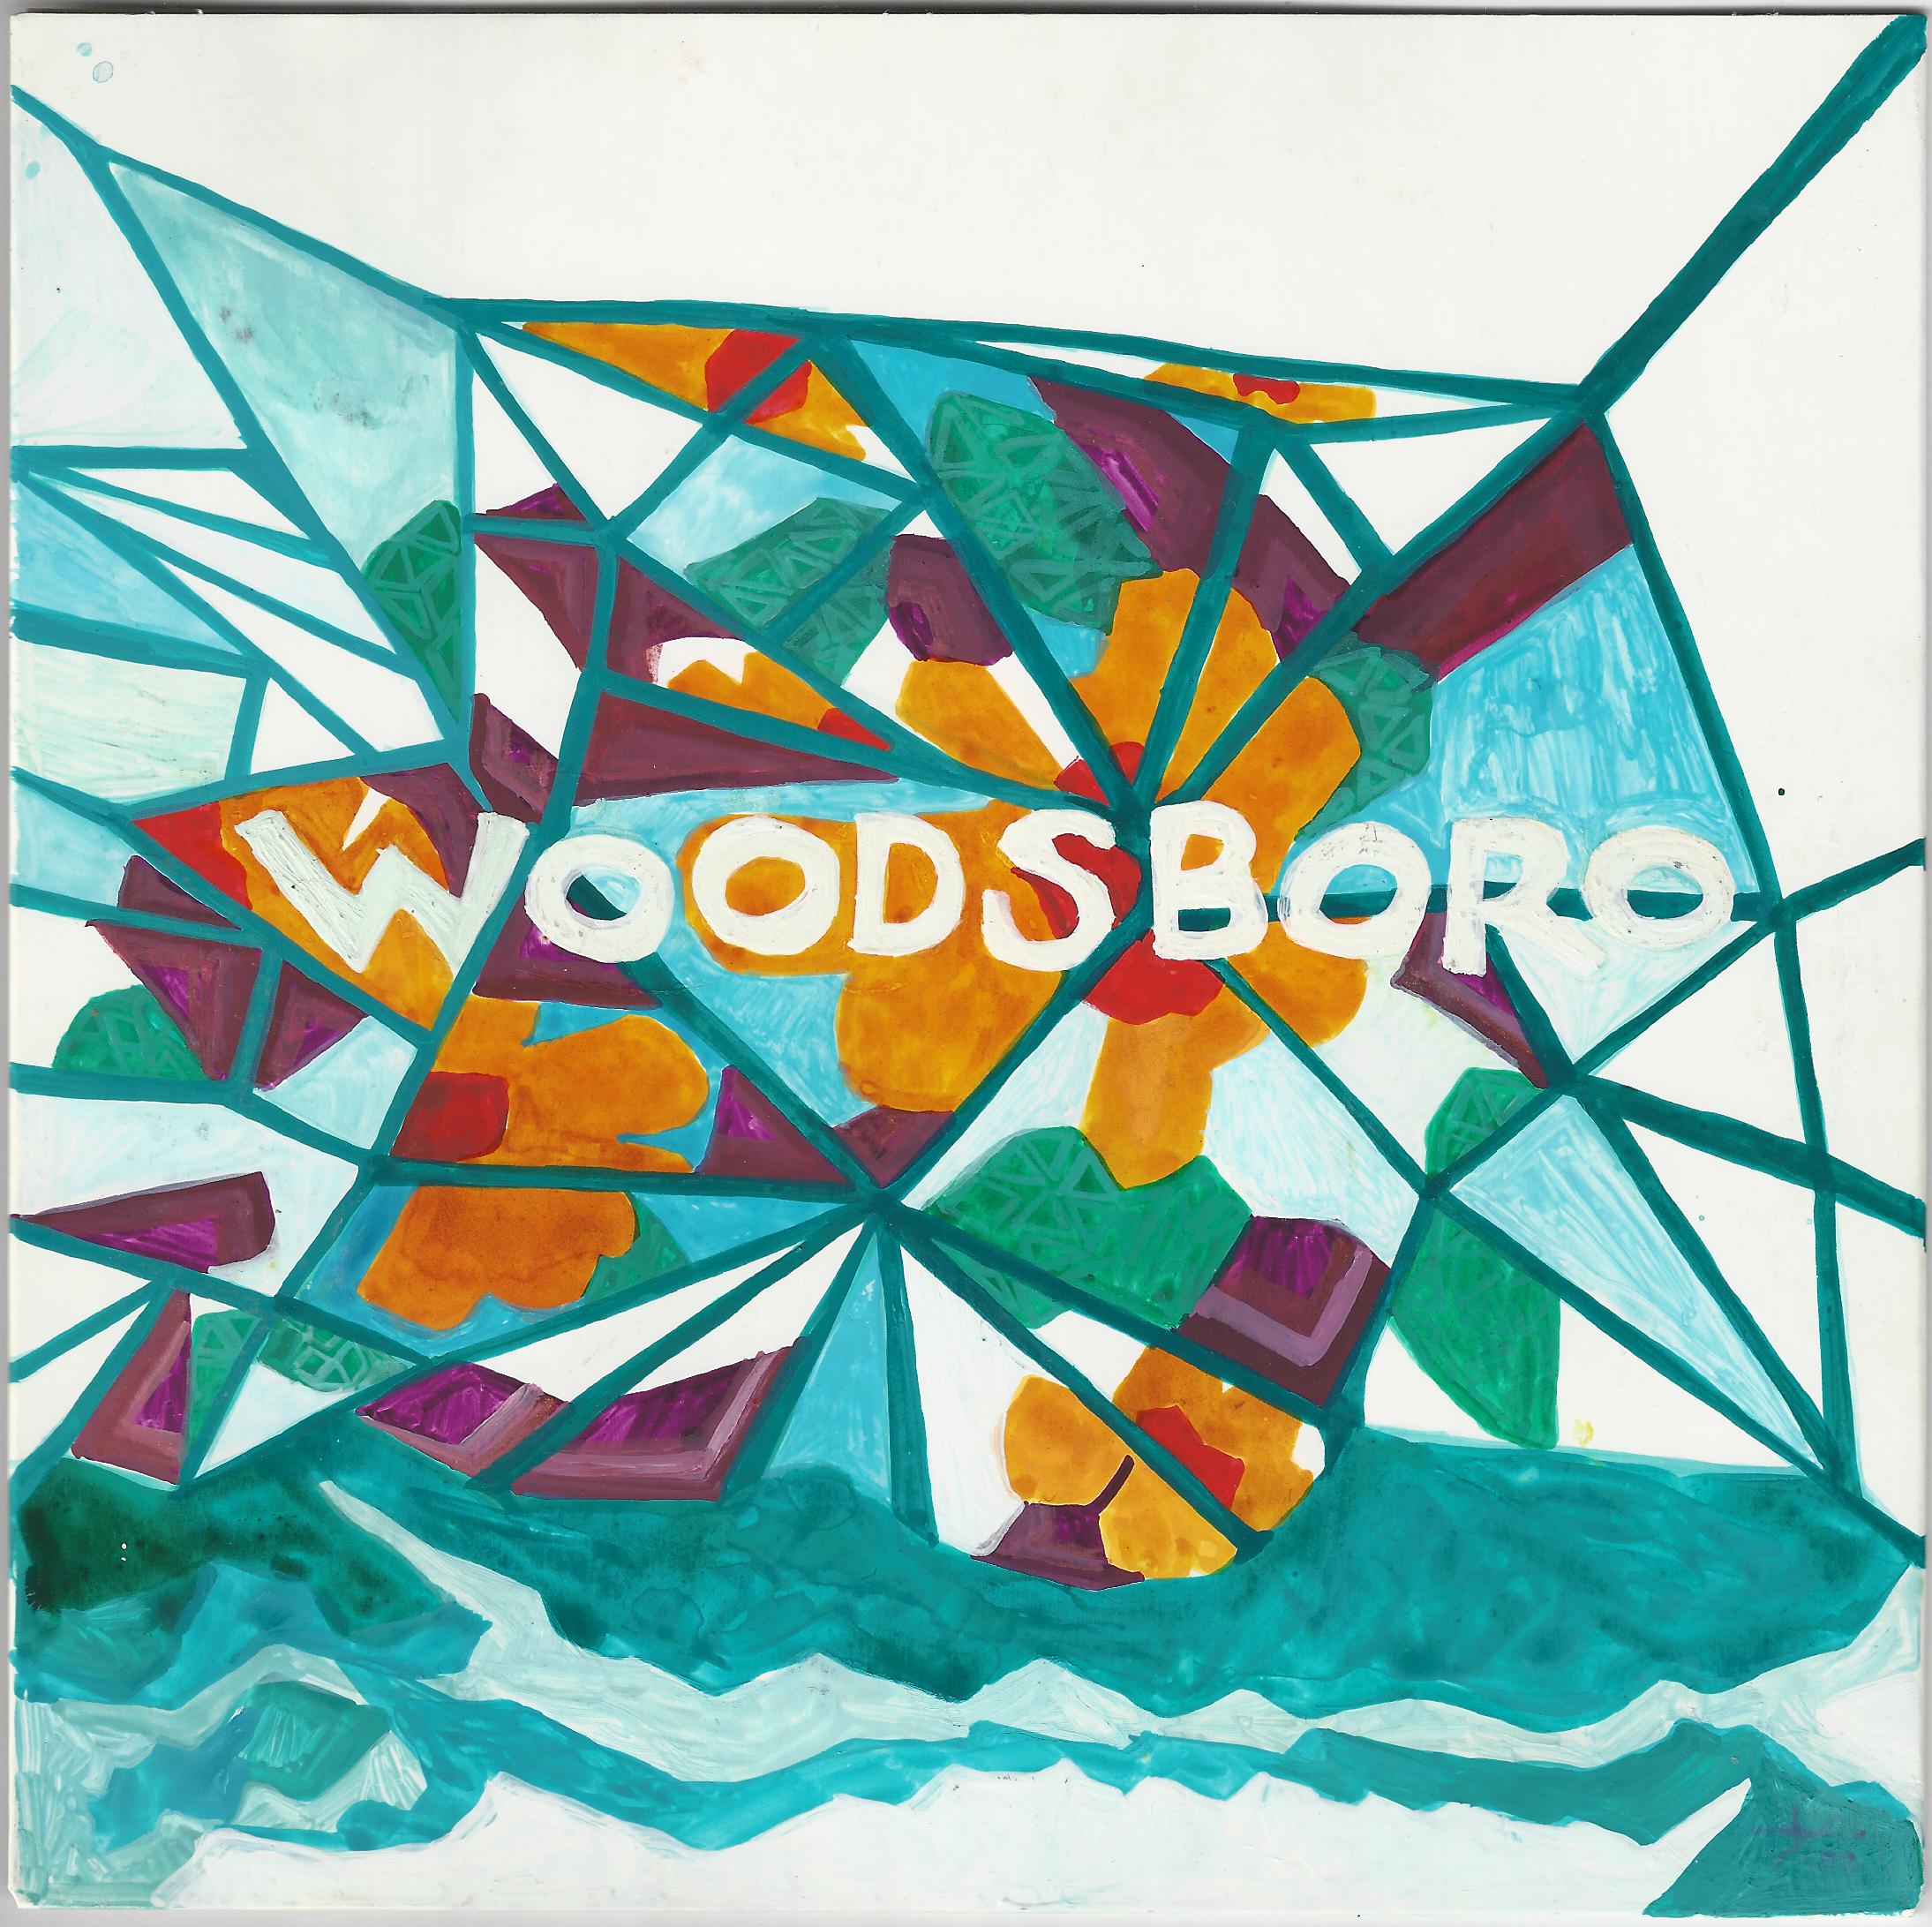 Woodsboro-Pocket Comb